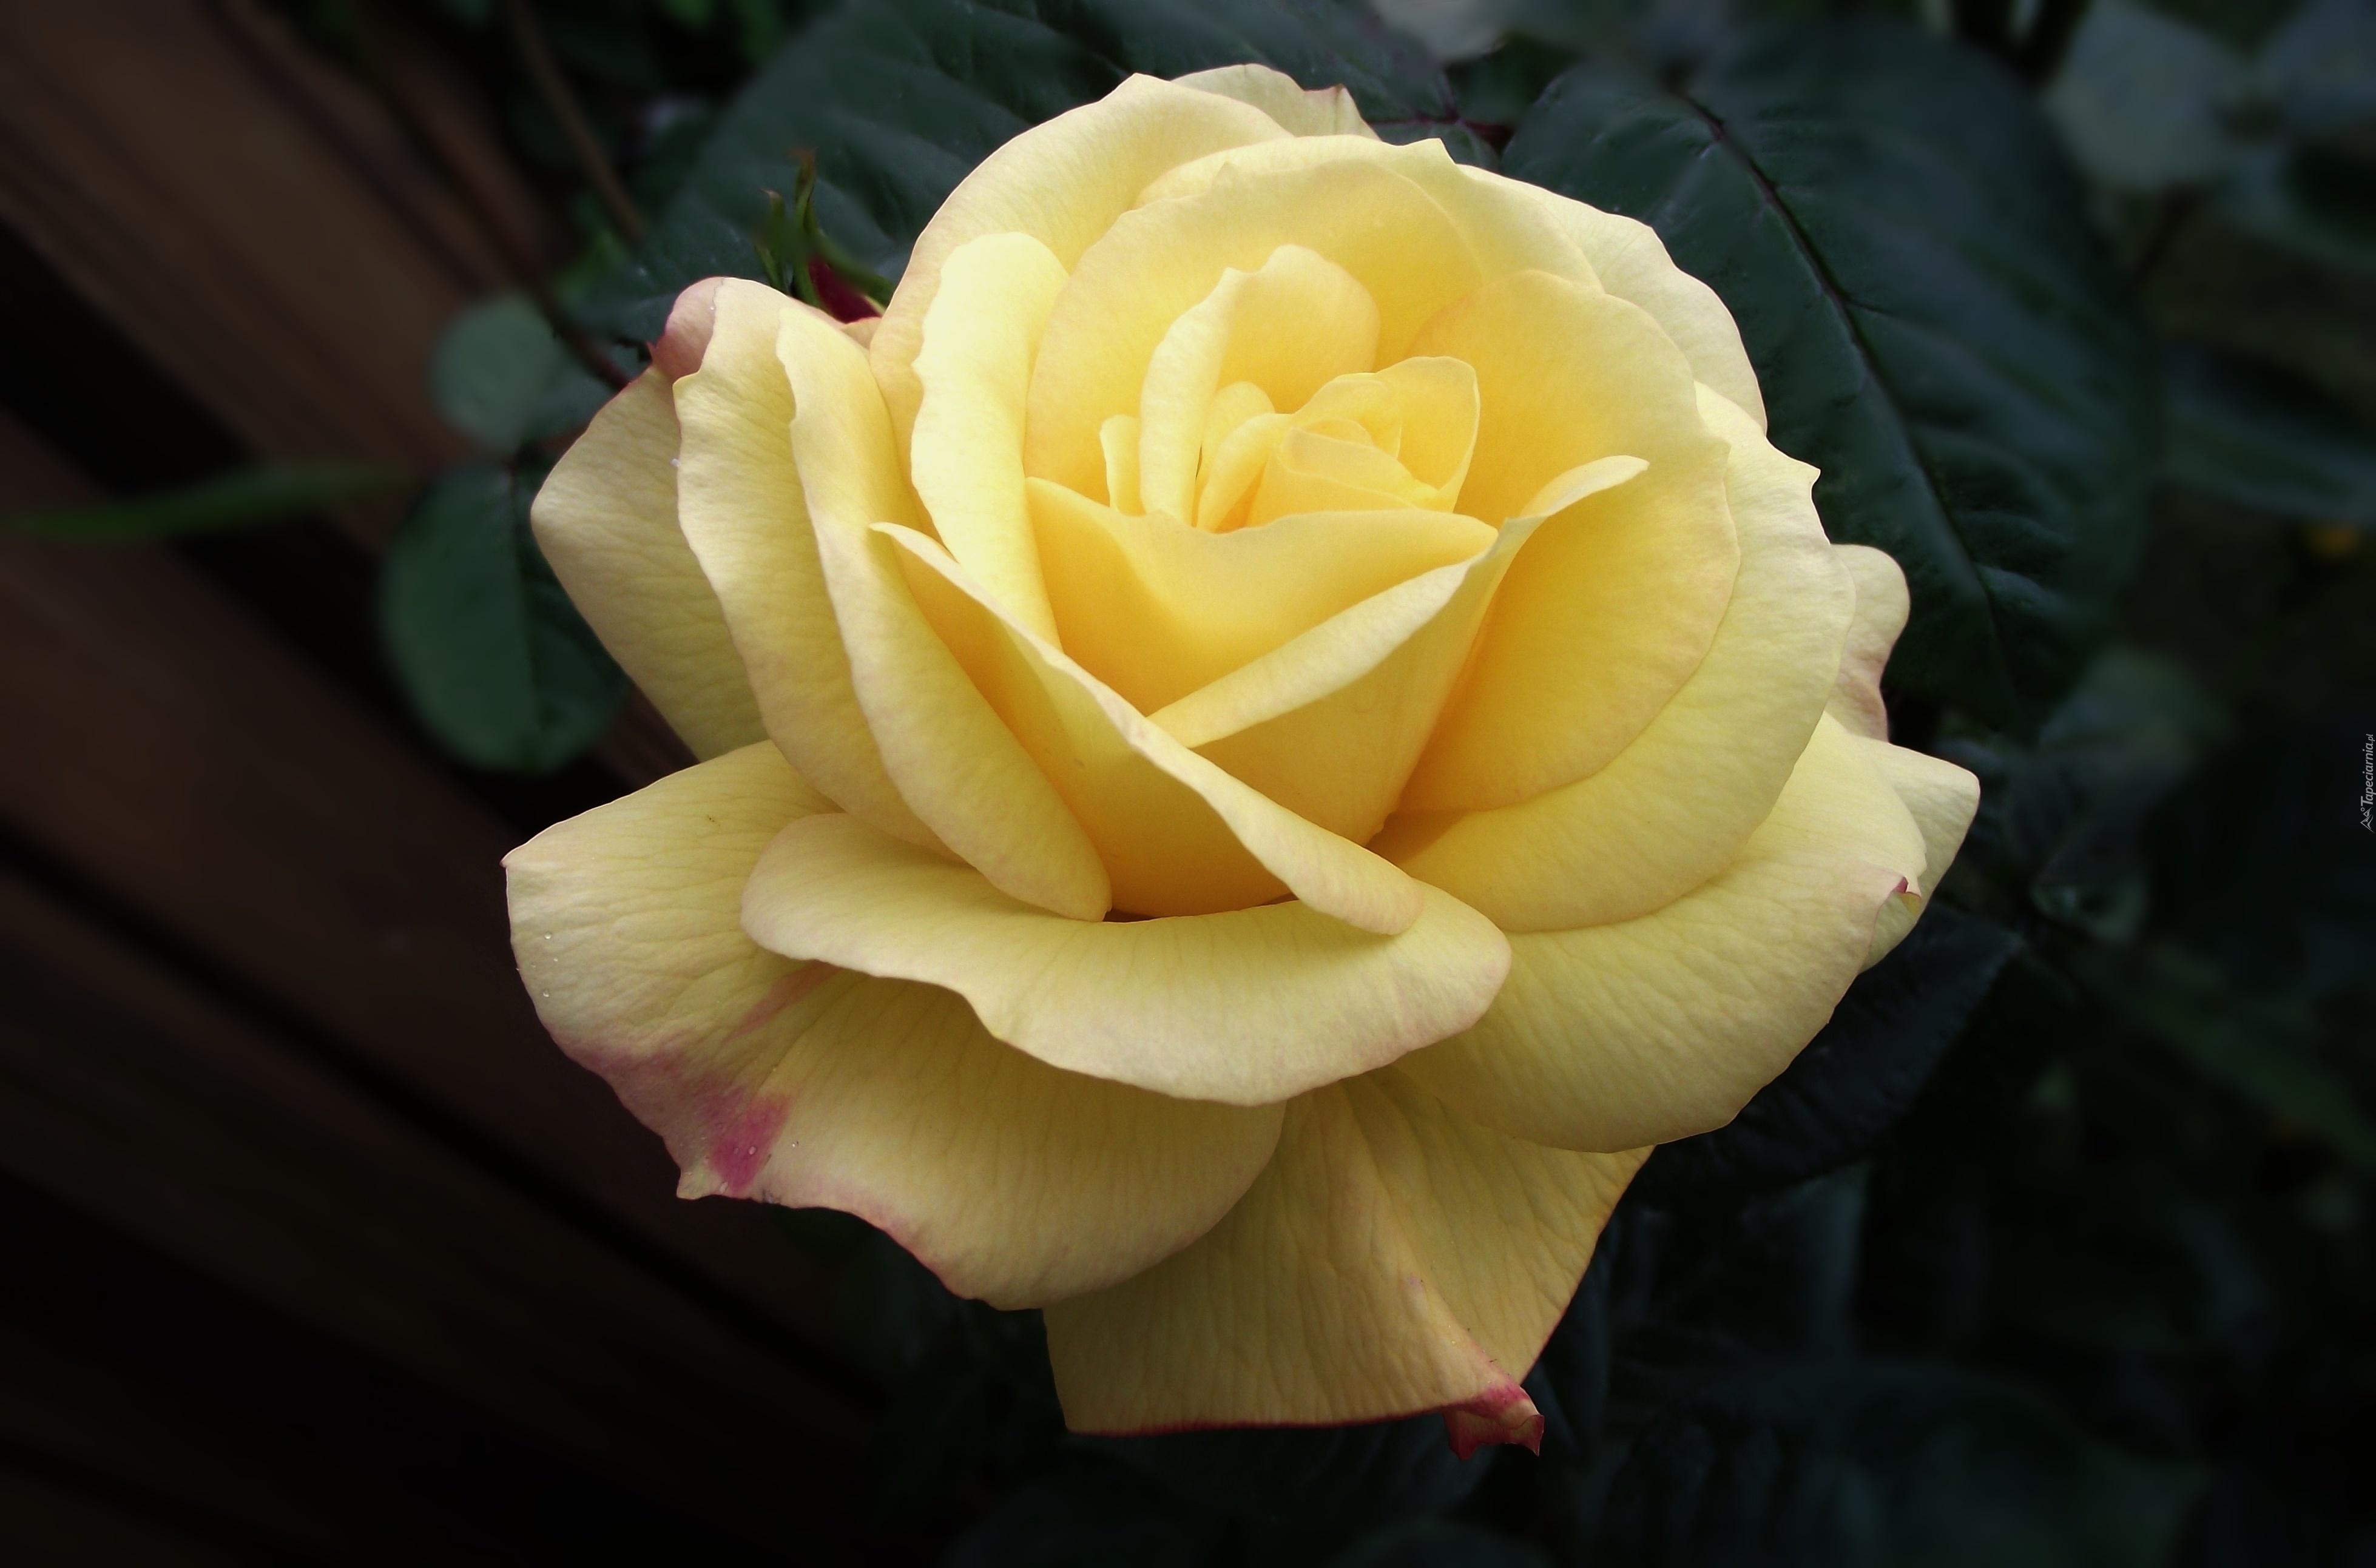 yellow love rose - HD1280×807